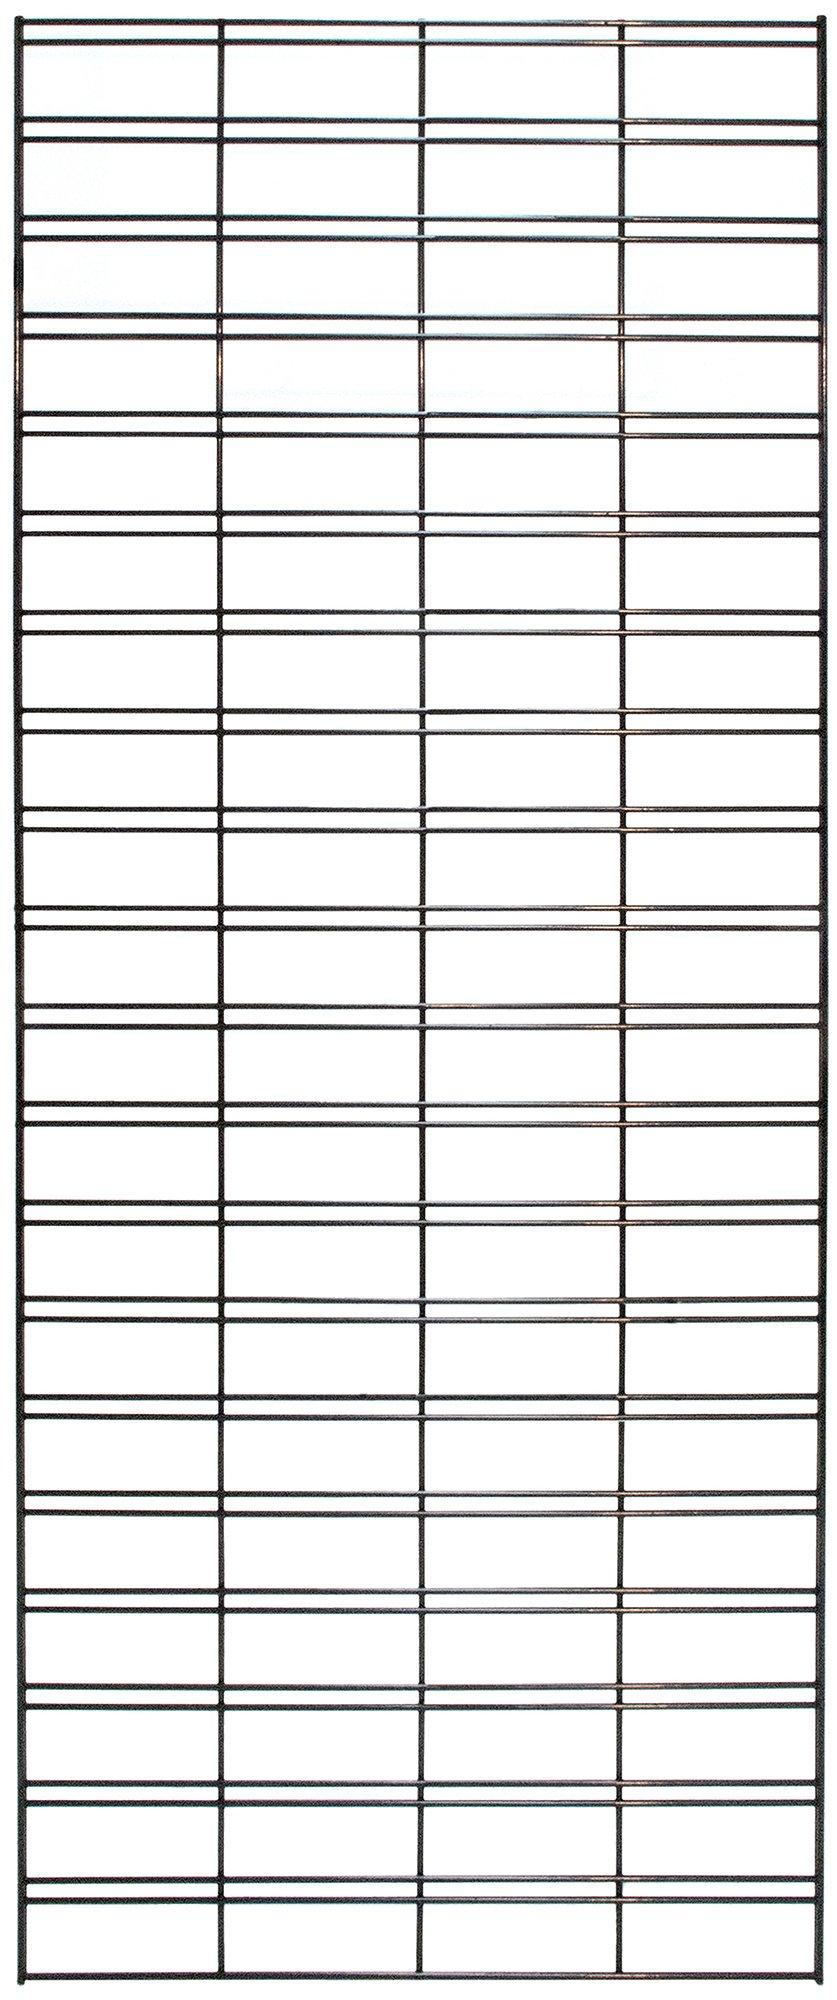 KC Store Fixtures A04250 Slatgrid Panel, 2' x 4', Black (Pack of 3)